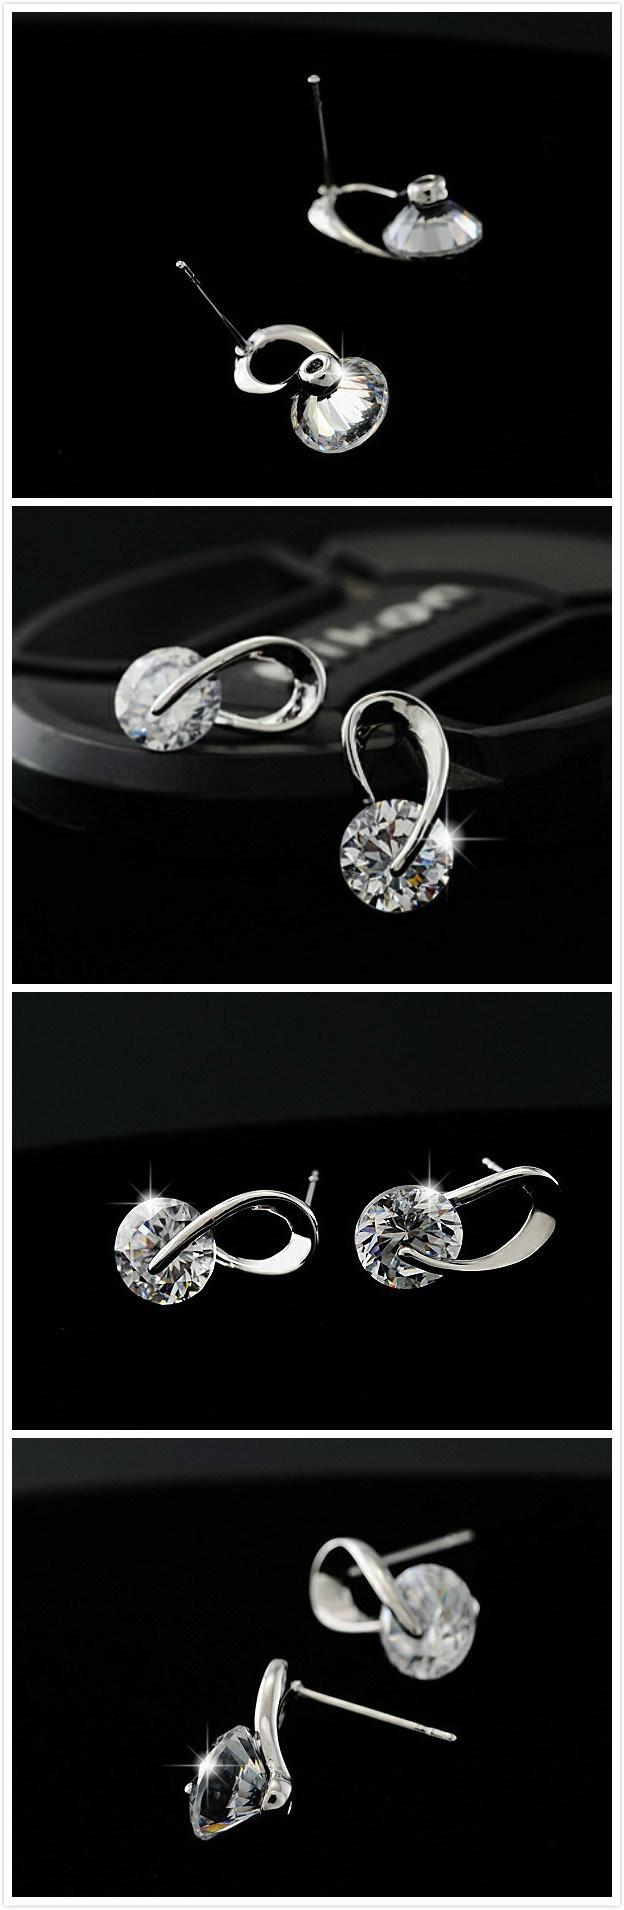 Crystal Wedding Pendientes Mujer Silver Color Zircon Crystal Stud Earrings